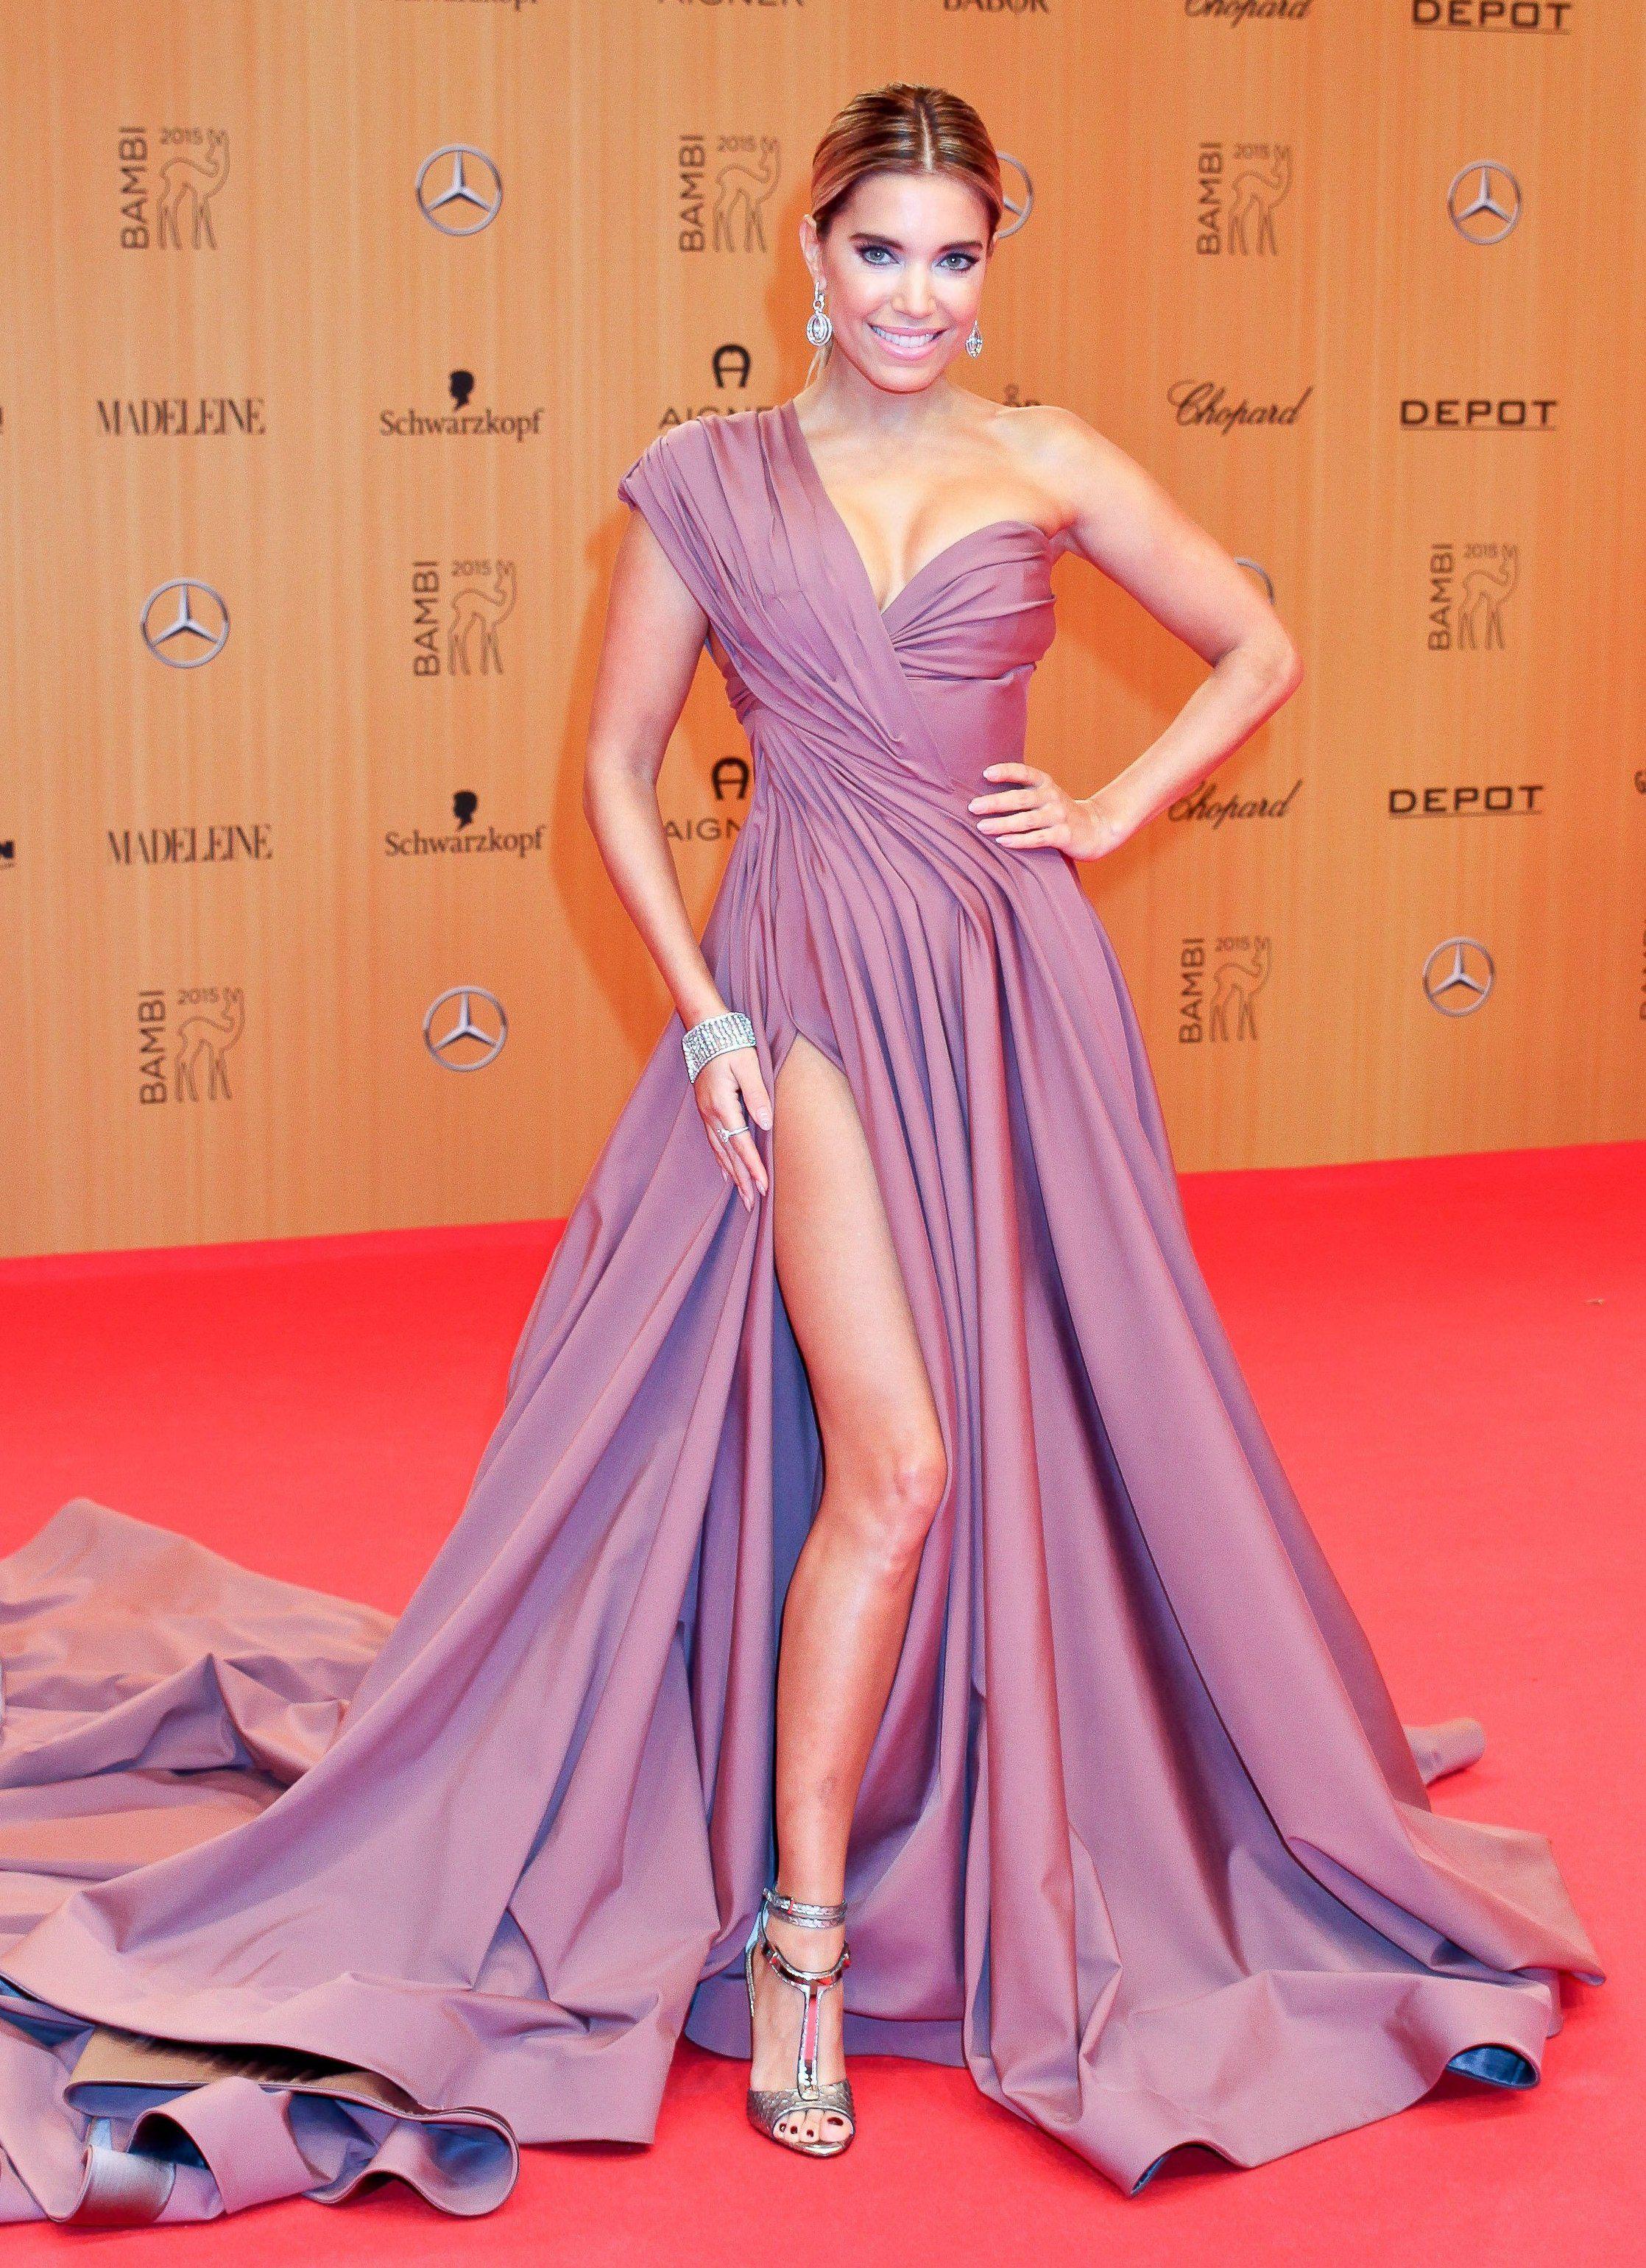 Sylvie Meis | Celebrity in Dress | Pinterest | Celebrity